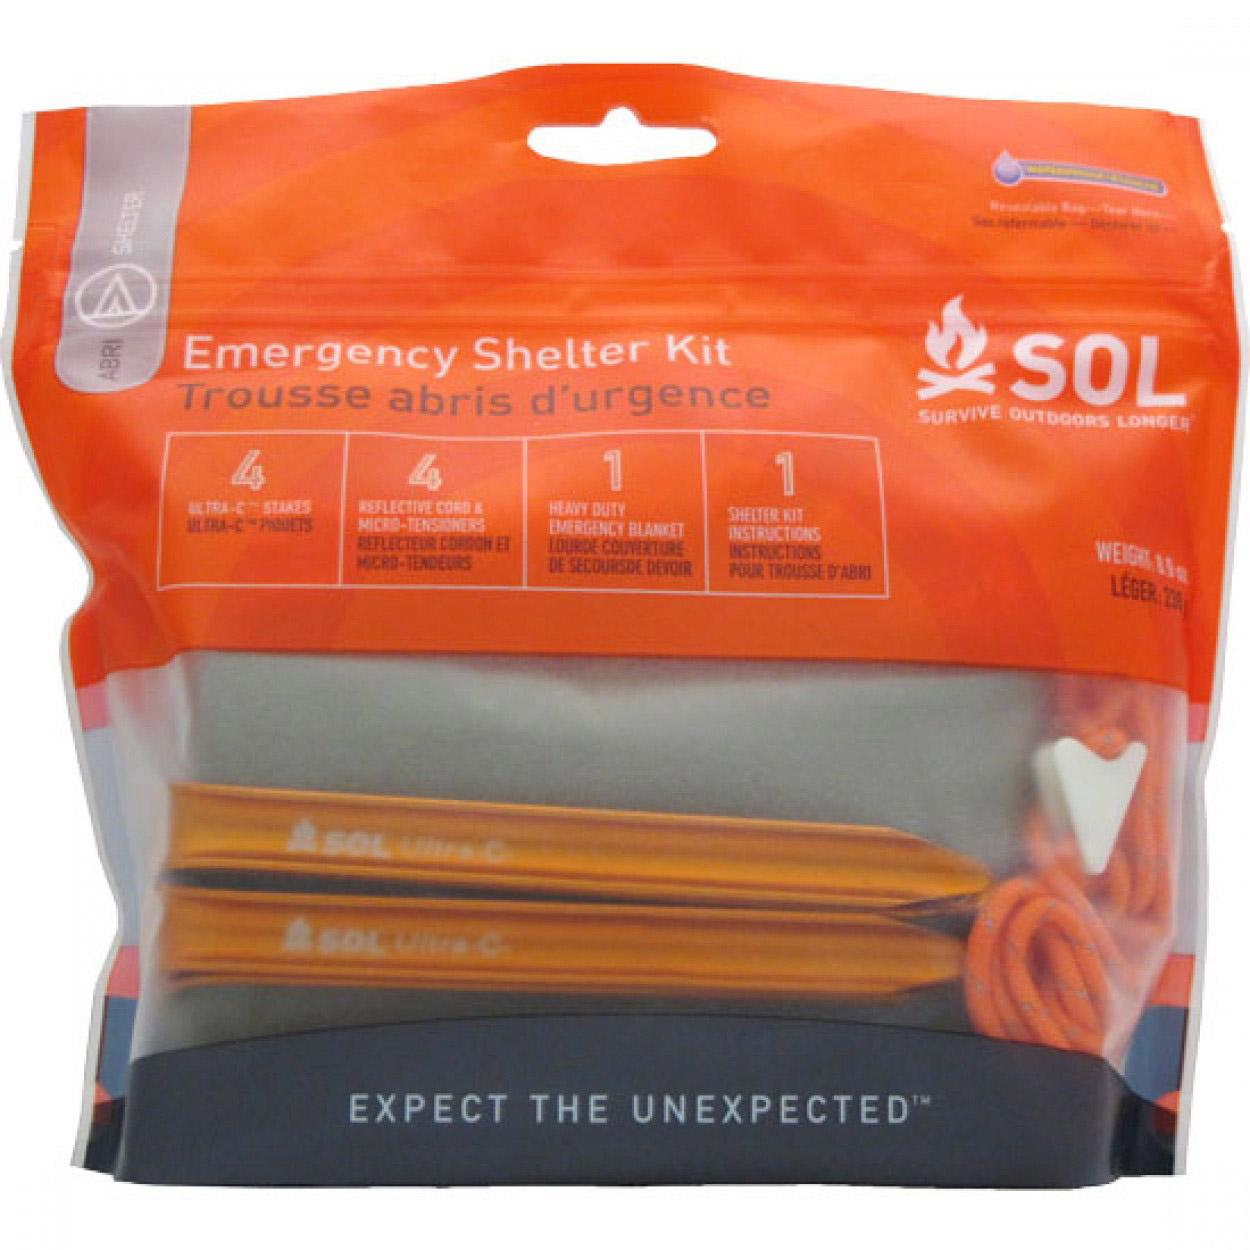 Emergency Shelter Kit